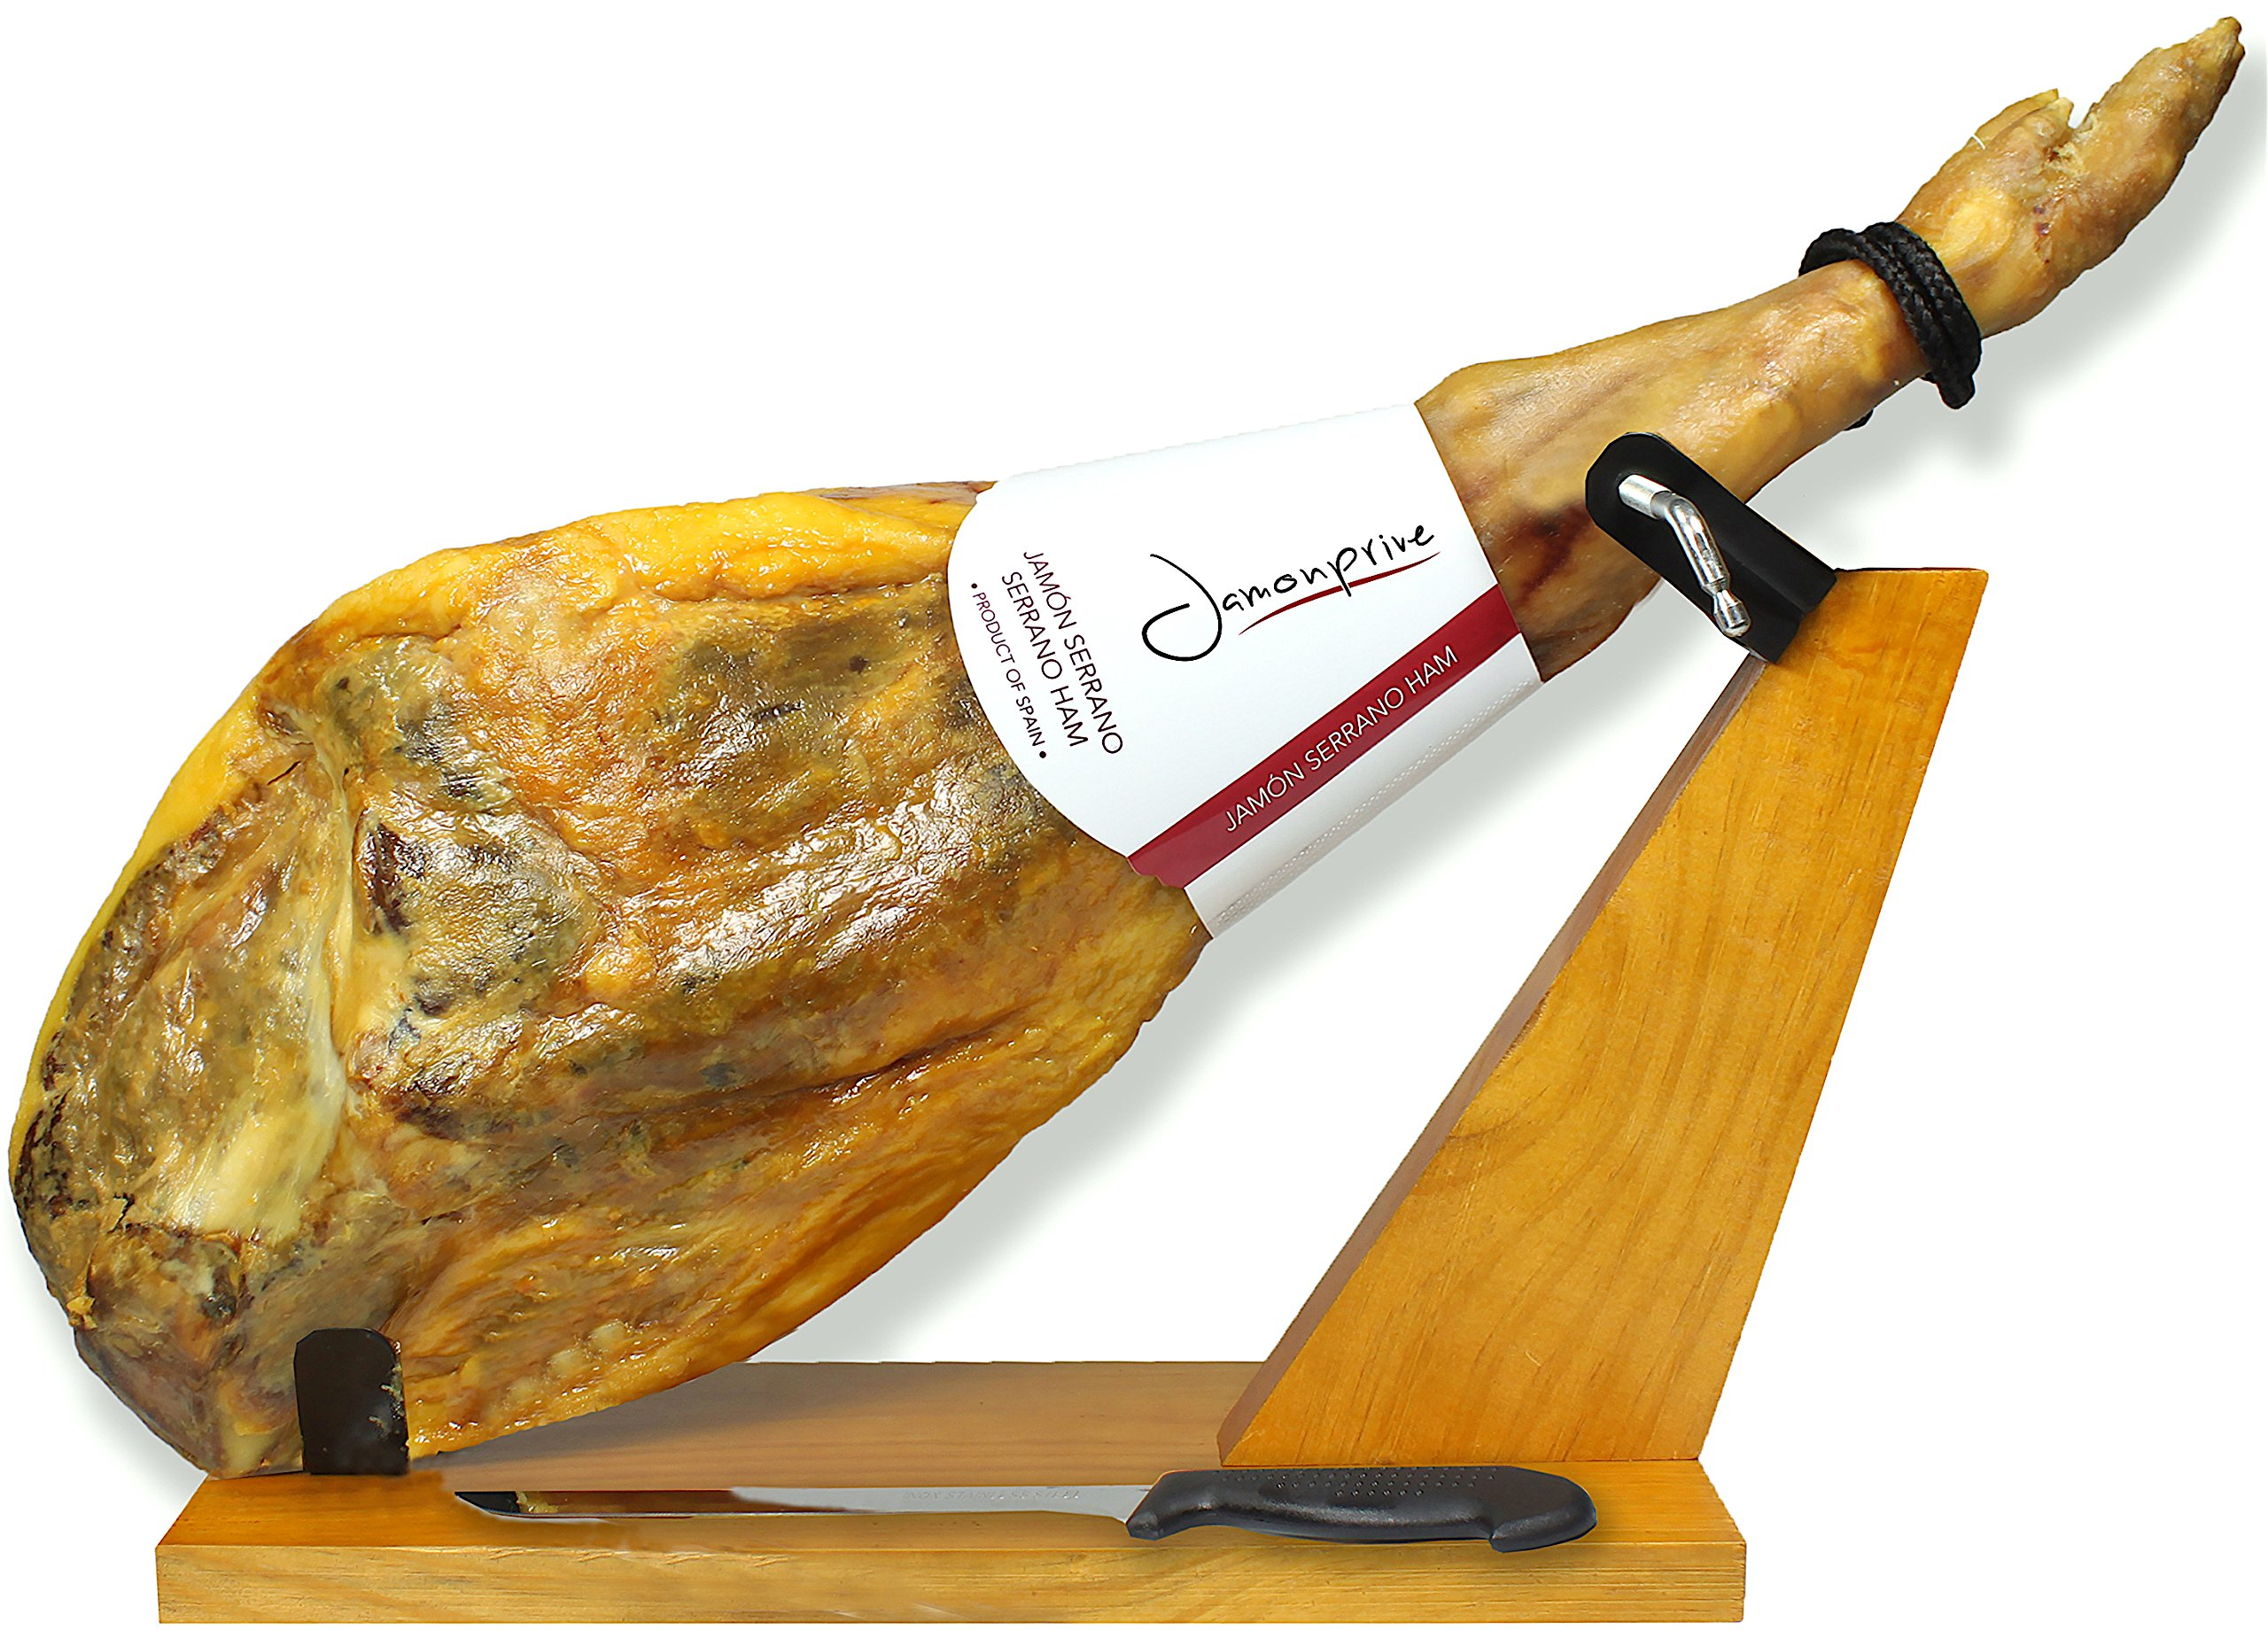 Serrano Ham Bone in from Spain 14.7-17 lb + Ham Stand + Knife   Cured Spanish Jamon Made with Mediterranean Sea Salt & NO Nitrates or Nitrites